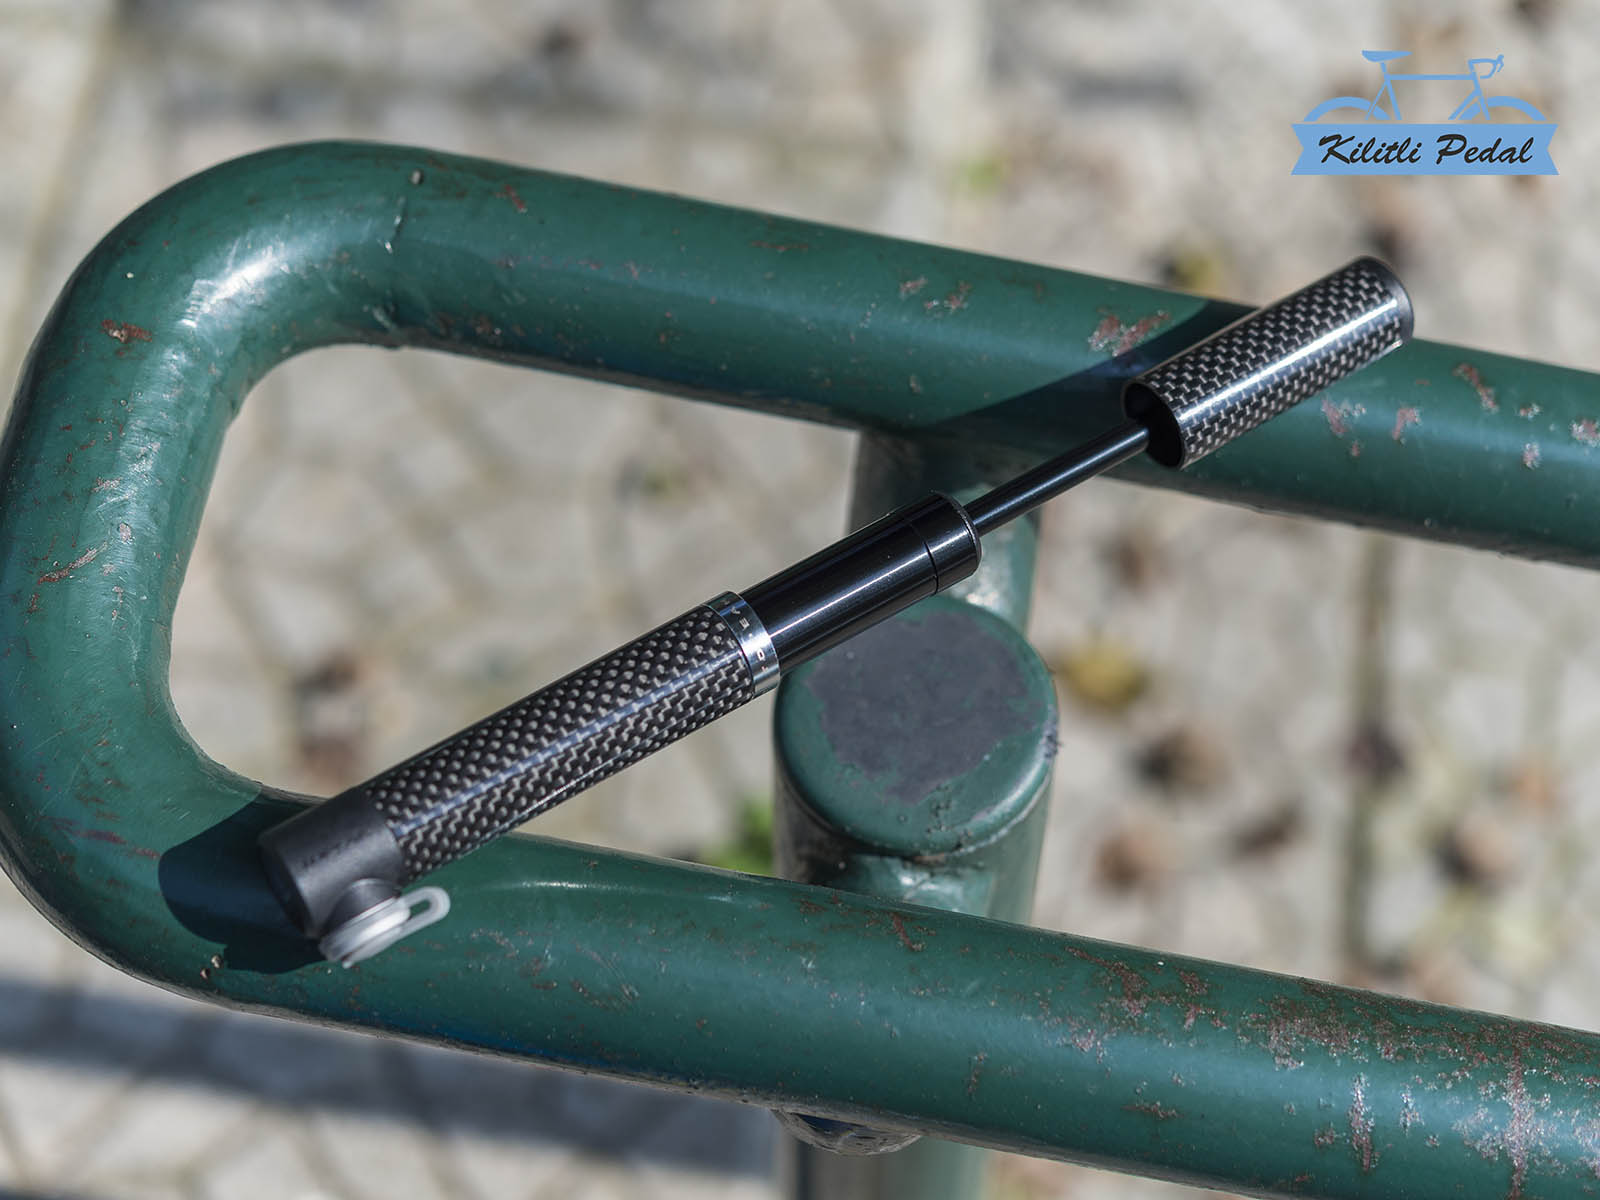 Topeak-Micro-Rocket-Karbon-Yol-Bisikleti-Pompası (4)